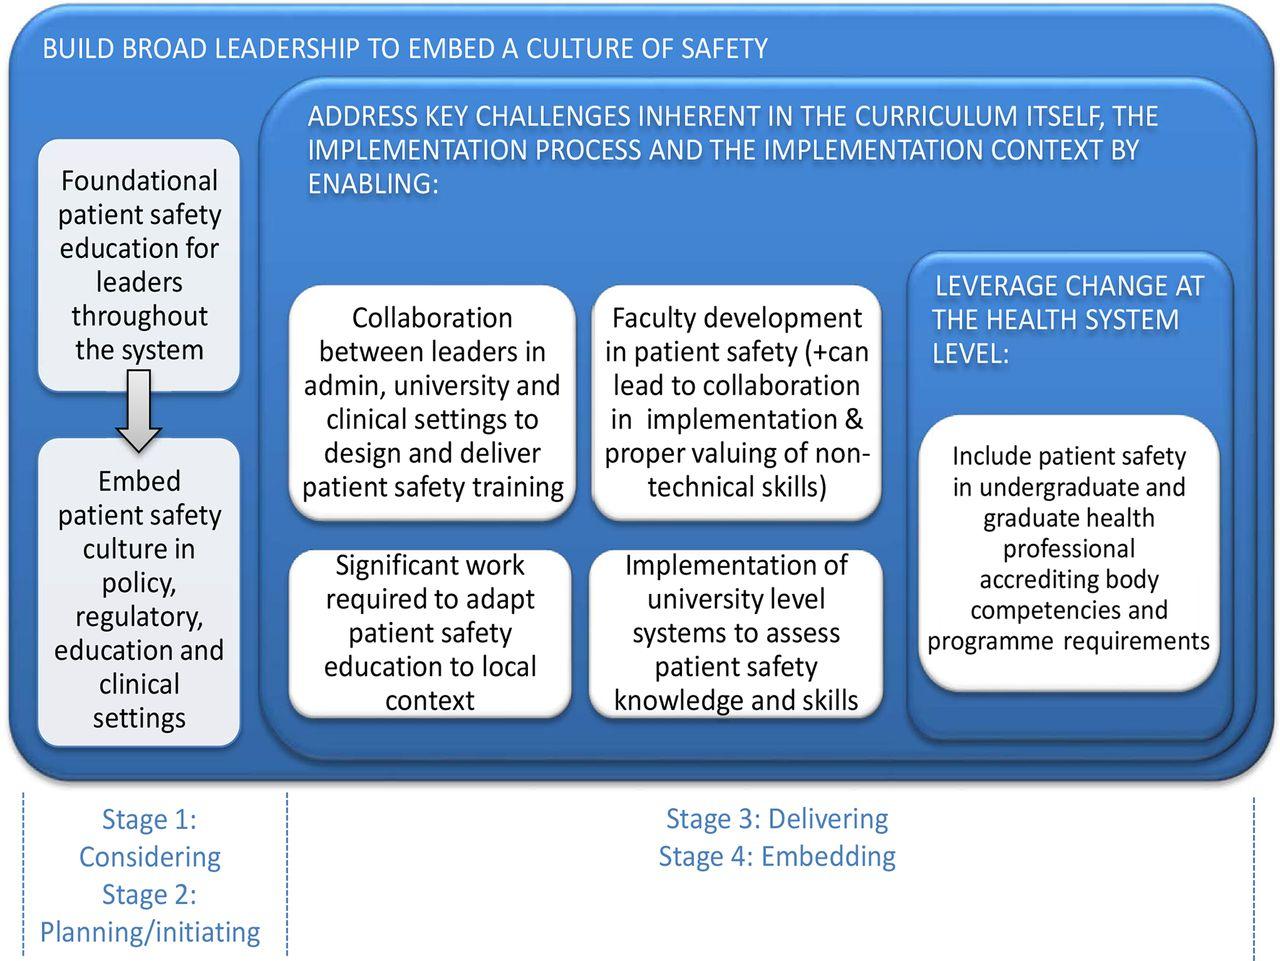 curriculum implementation process